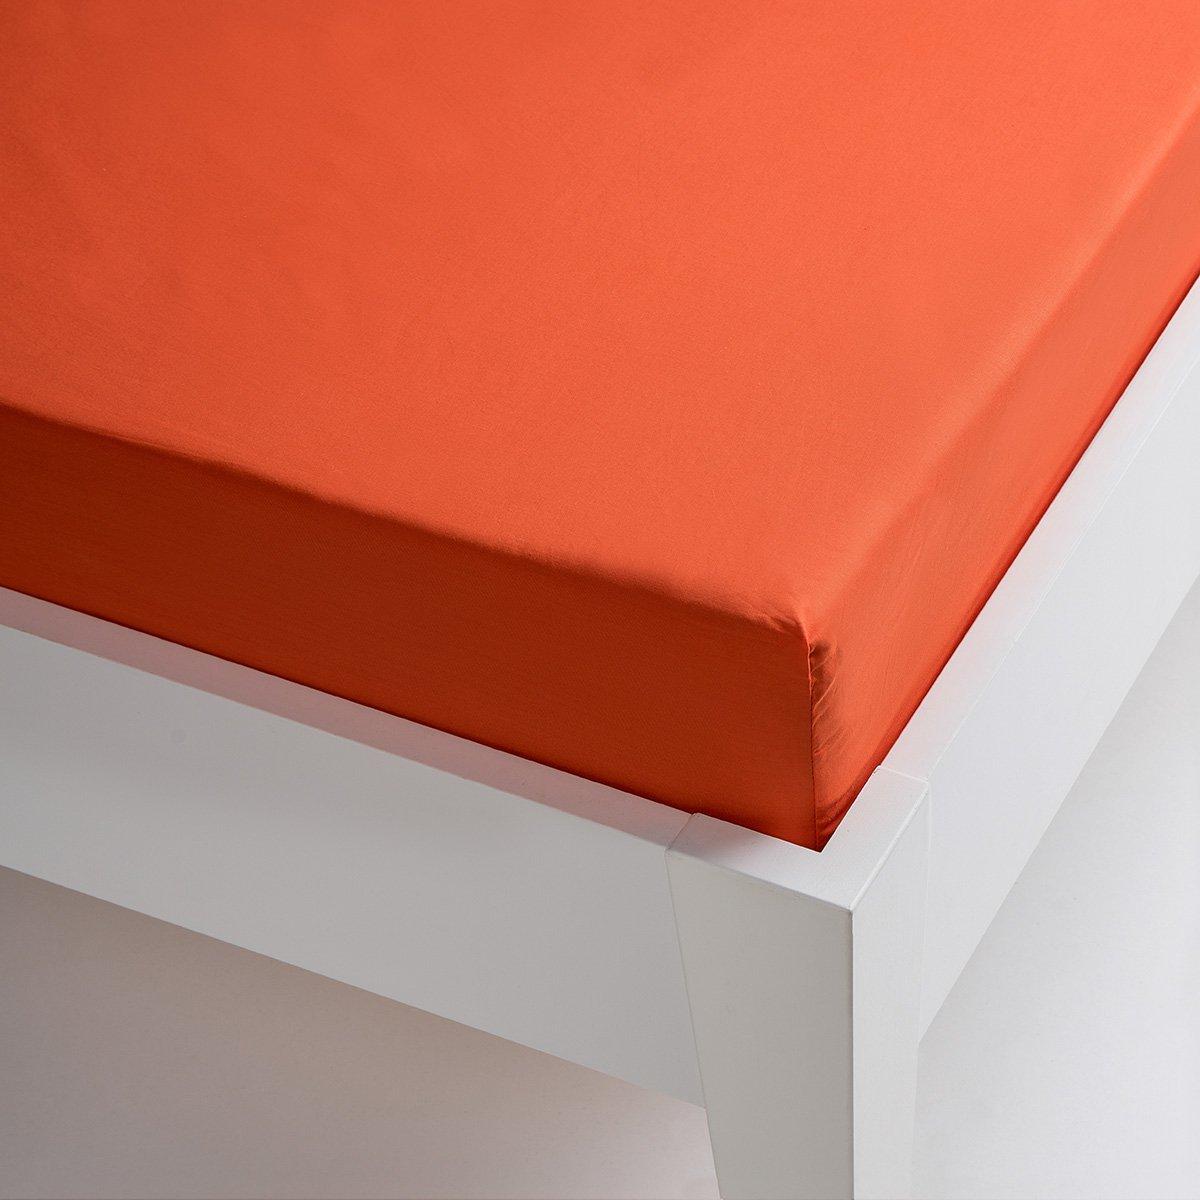 Sancarlos - Sábana bajera , 100% Algodón percal, Color naranja, Cama de 150